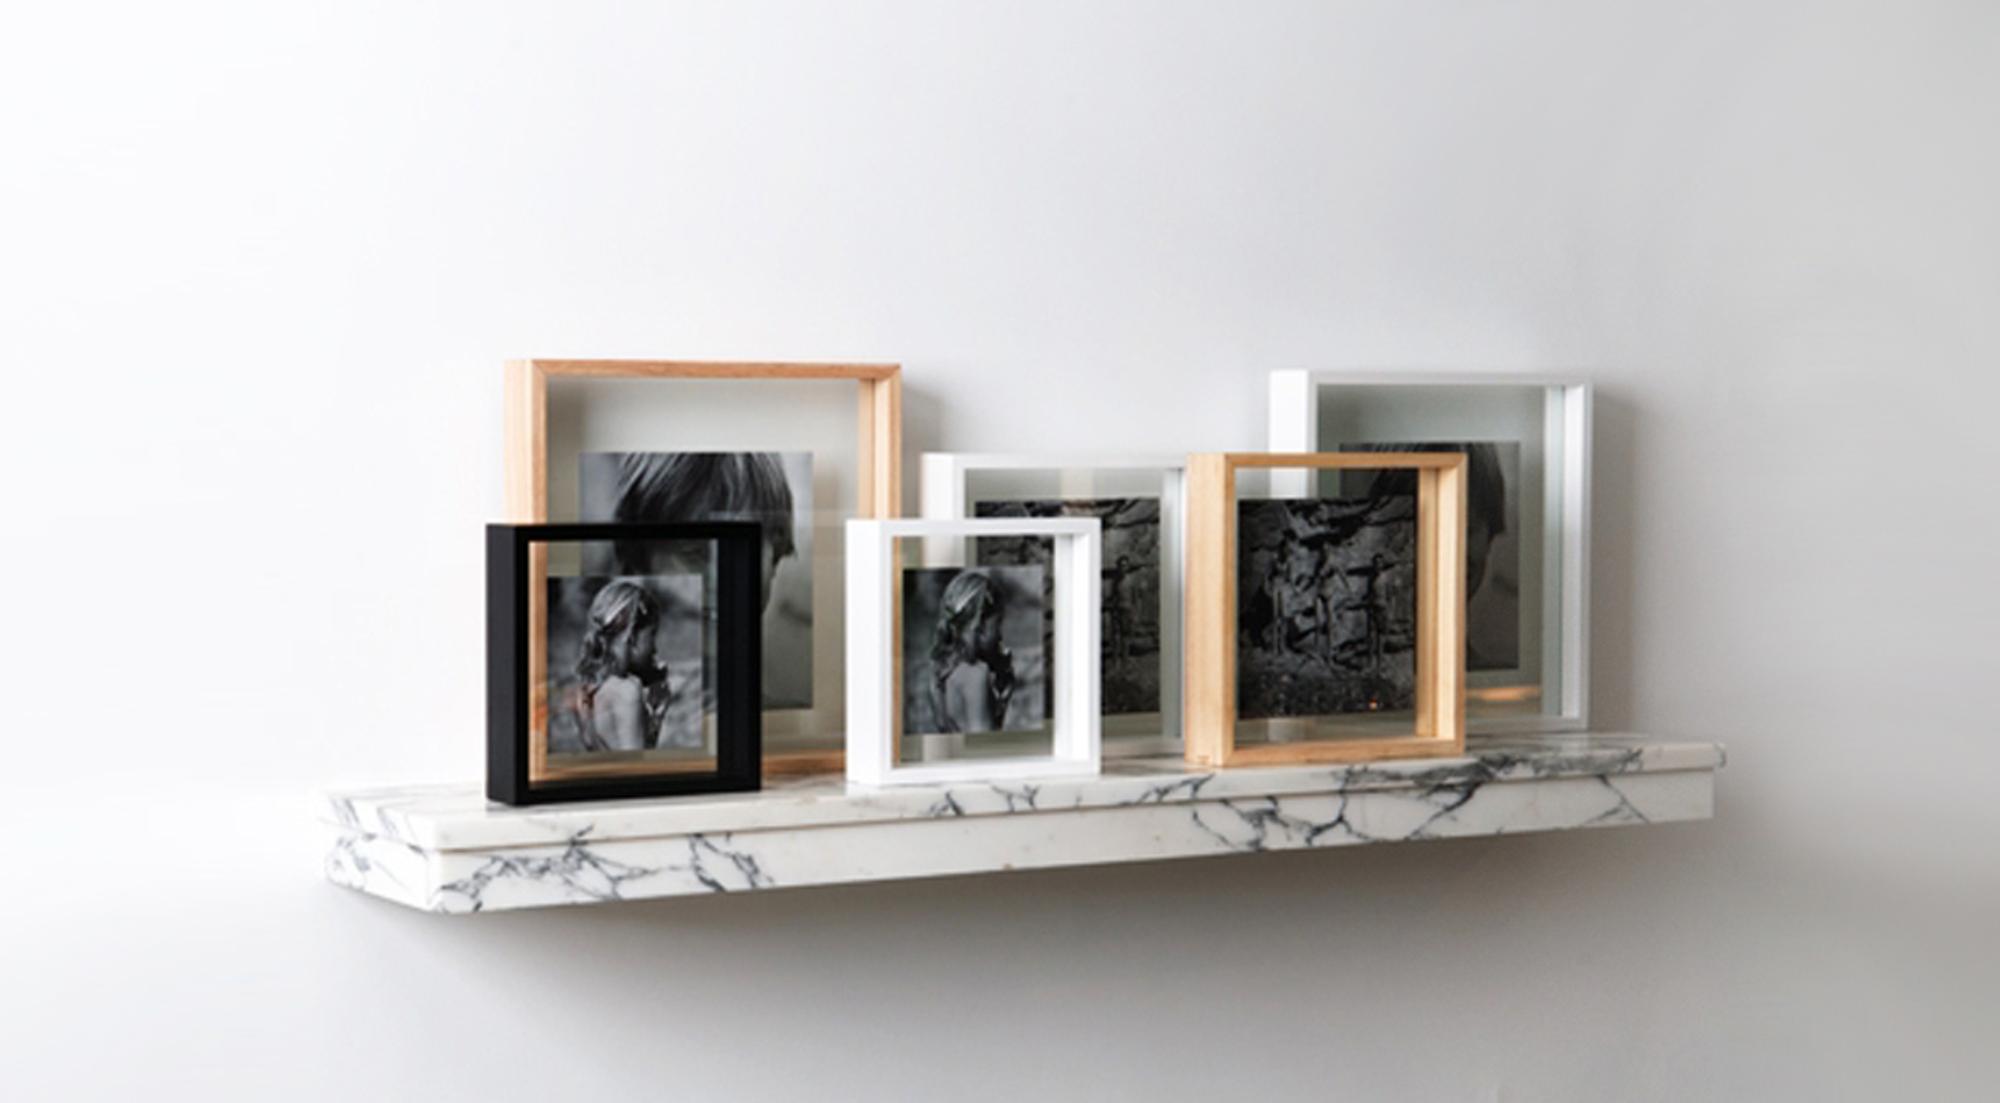 designapplause floating box picture frame xlboom. Black Bedroom Furniture Sets. Home Design Ideas